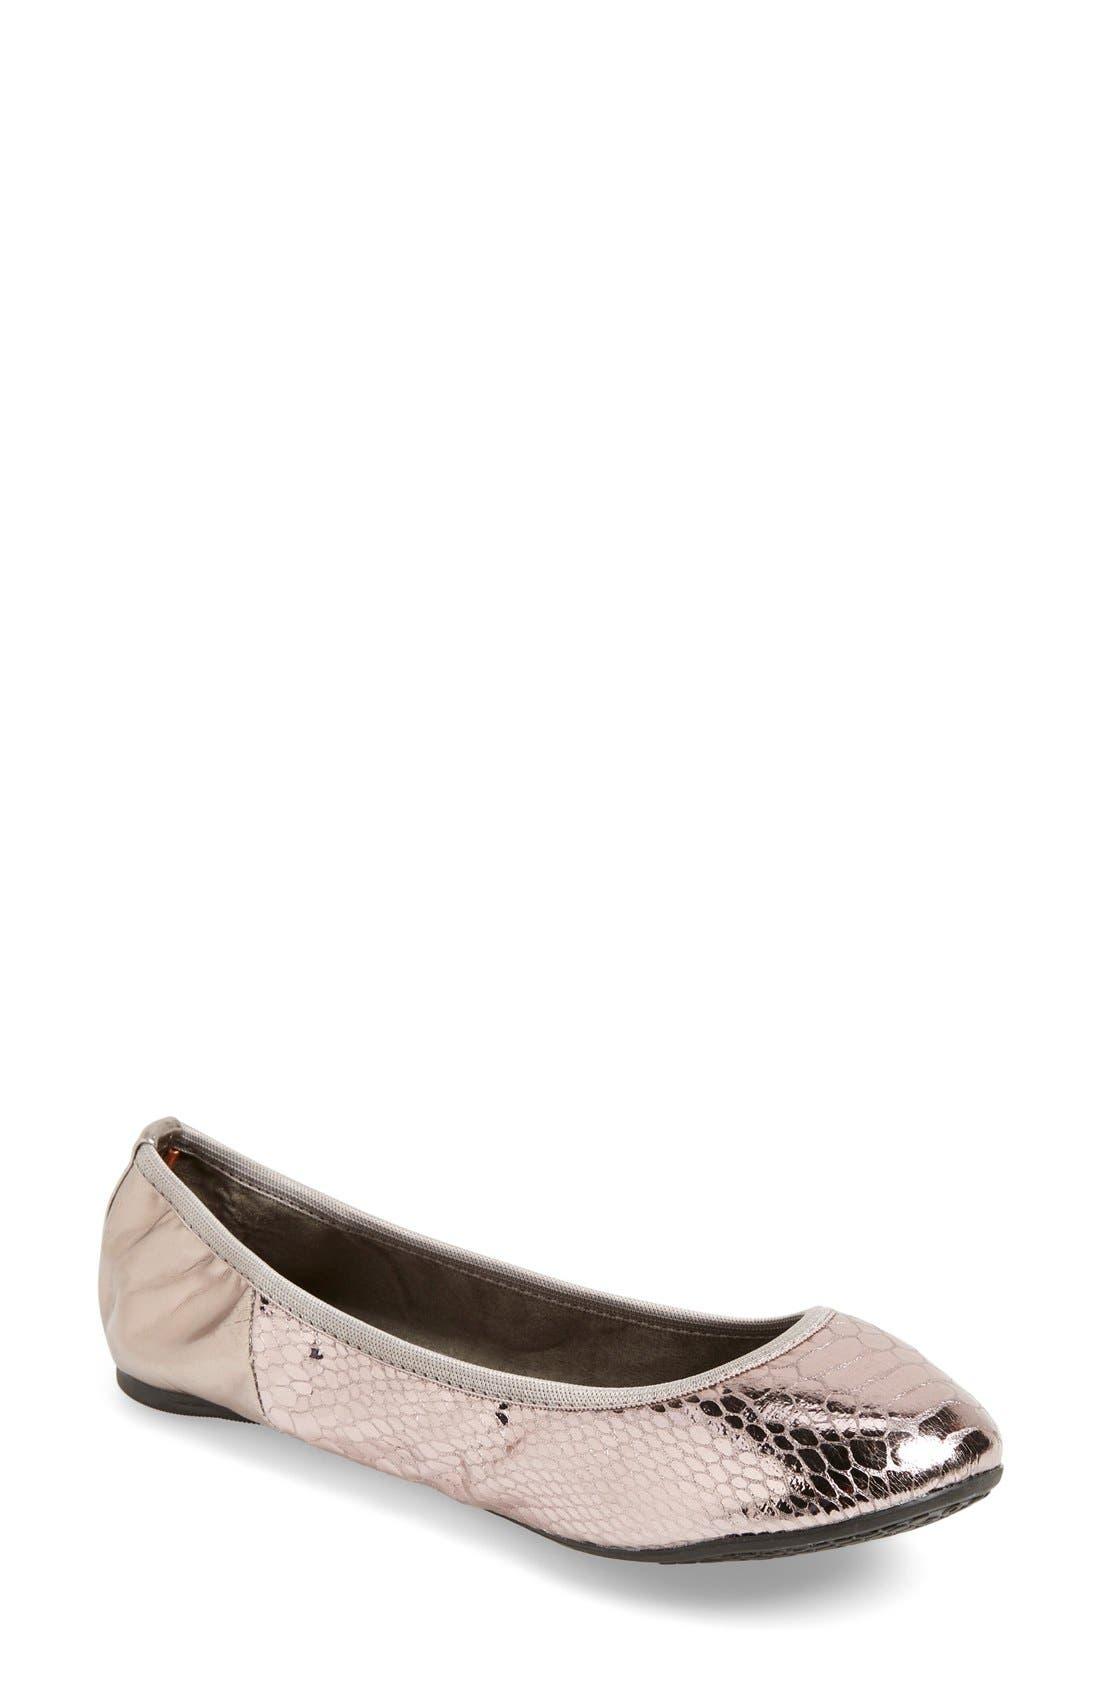 Alternate Image 1 Selected - Butterfly Twists 'Vivienne' Foldable Ballet Flat (Women)